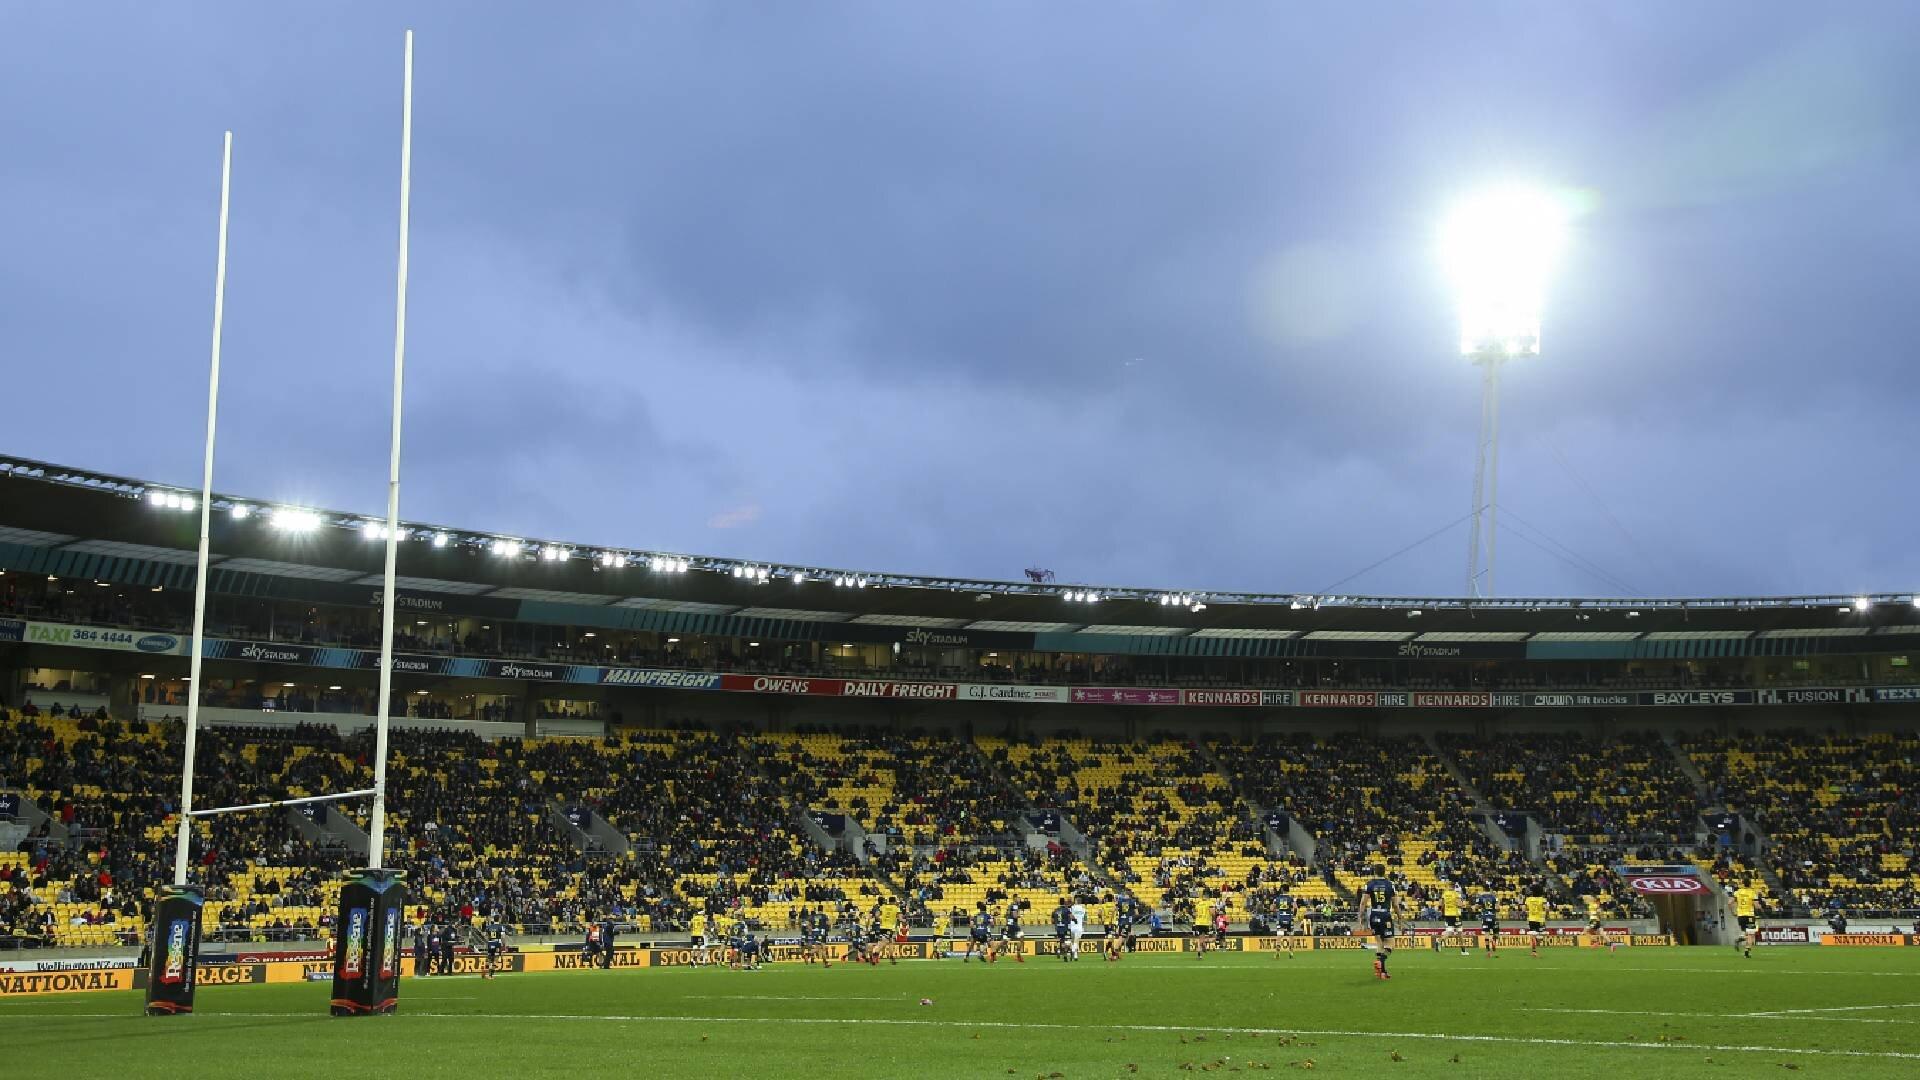 'Don't go': All Blacks fans issued warning ahead of Bledisloe Cup test in Wellington